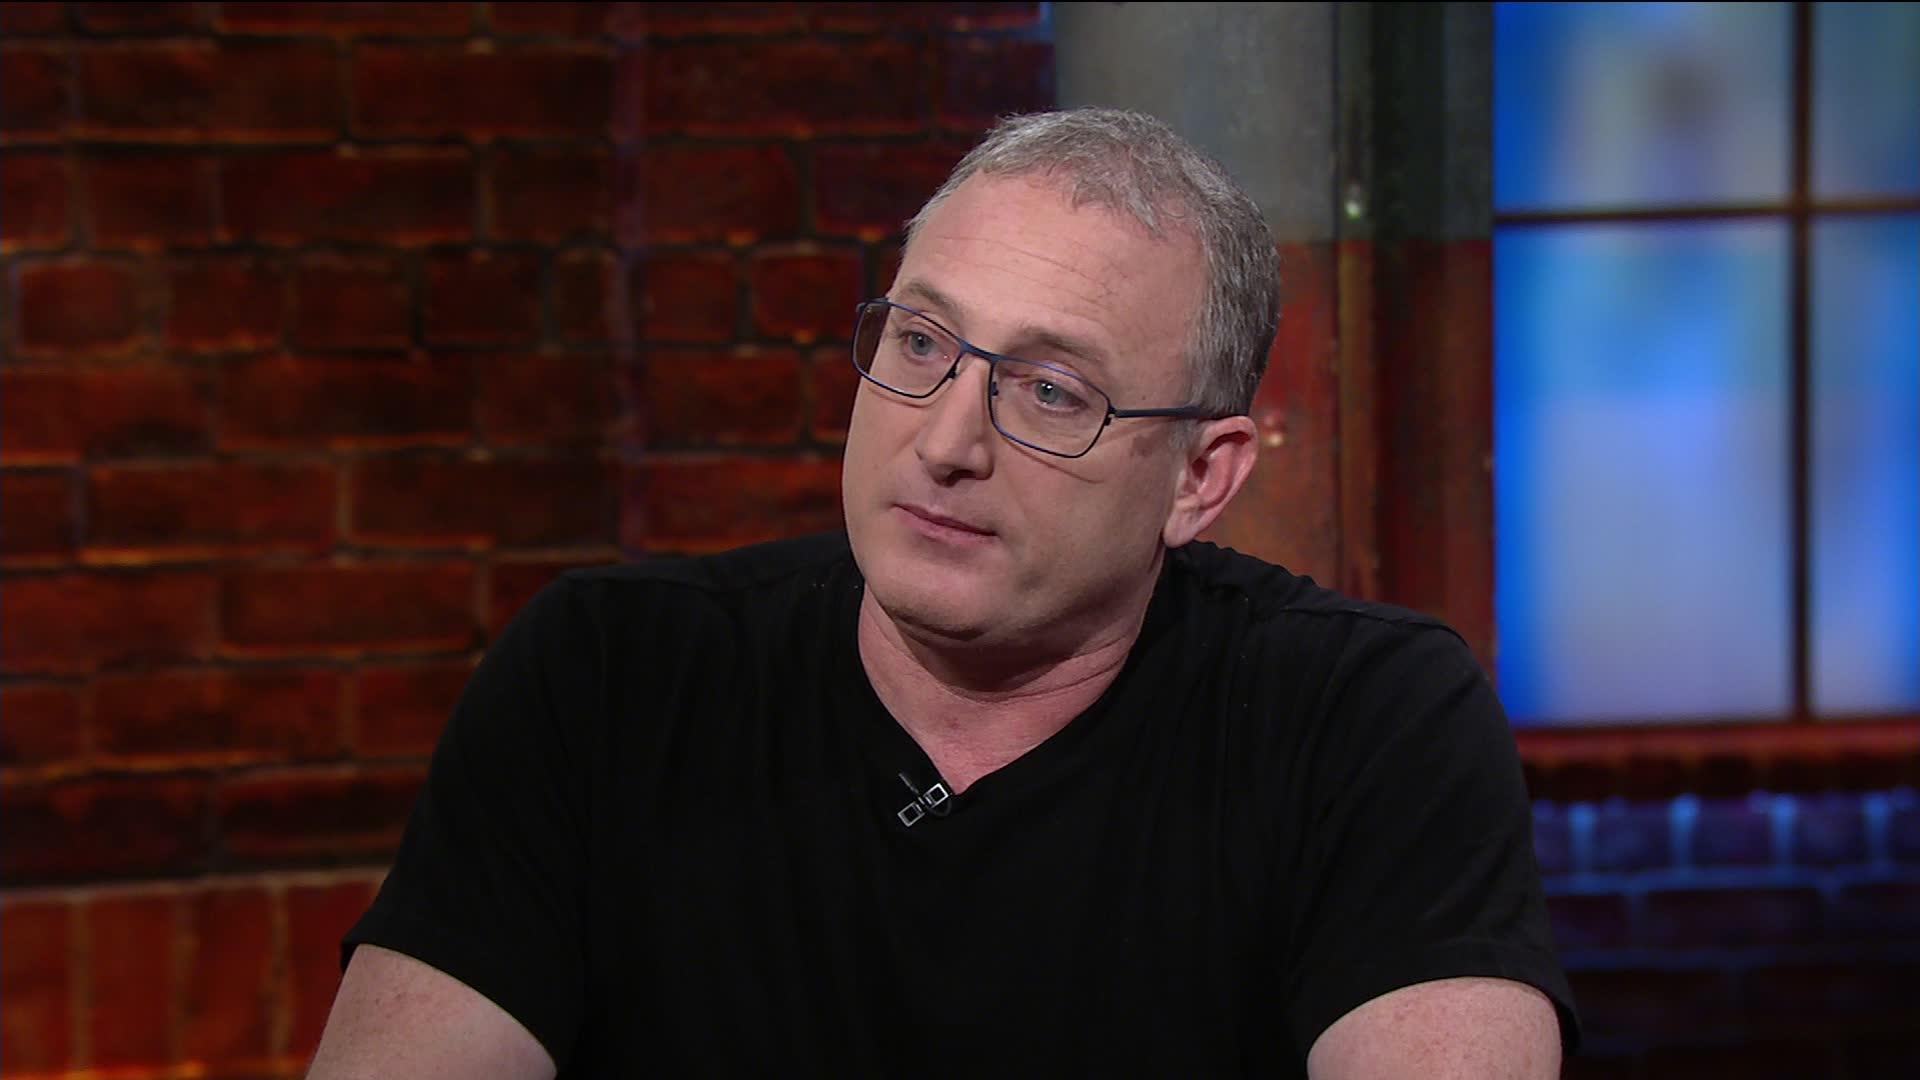 Waze CEO: We're creating micro public transit